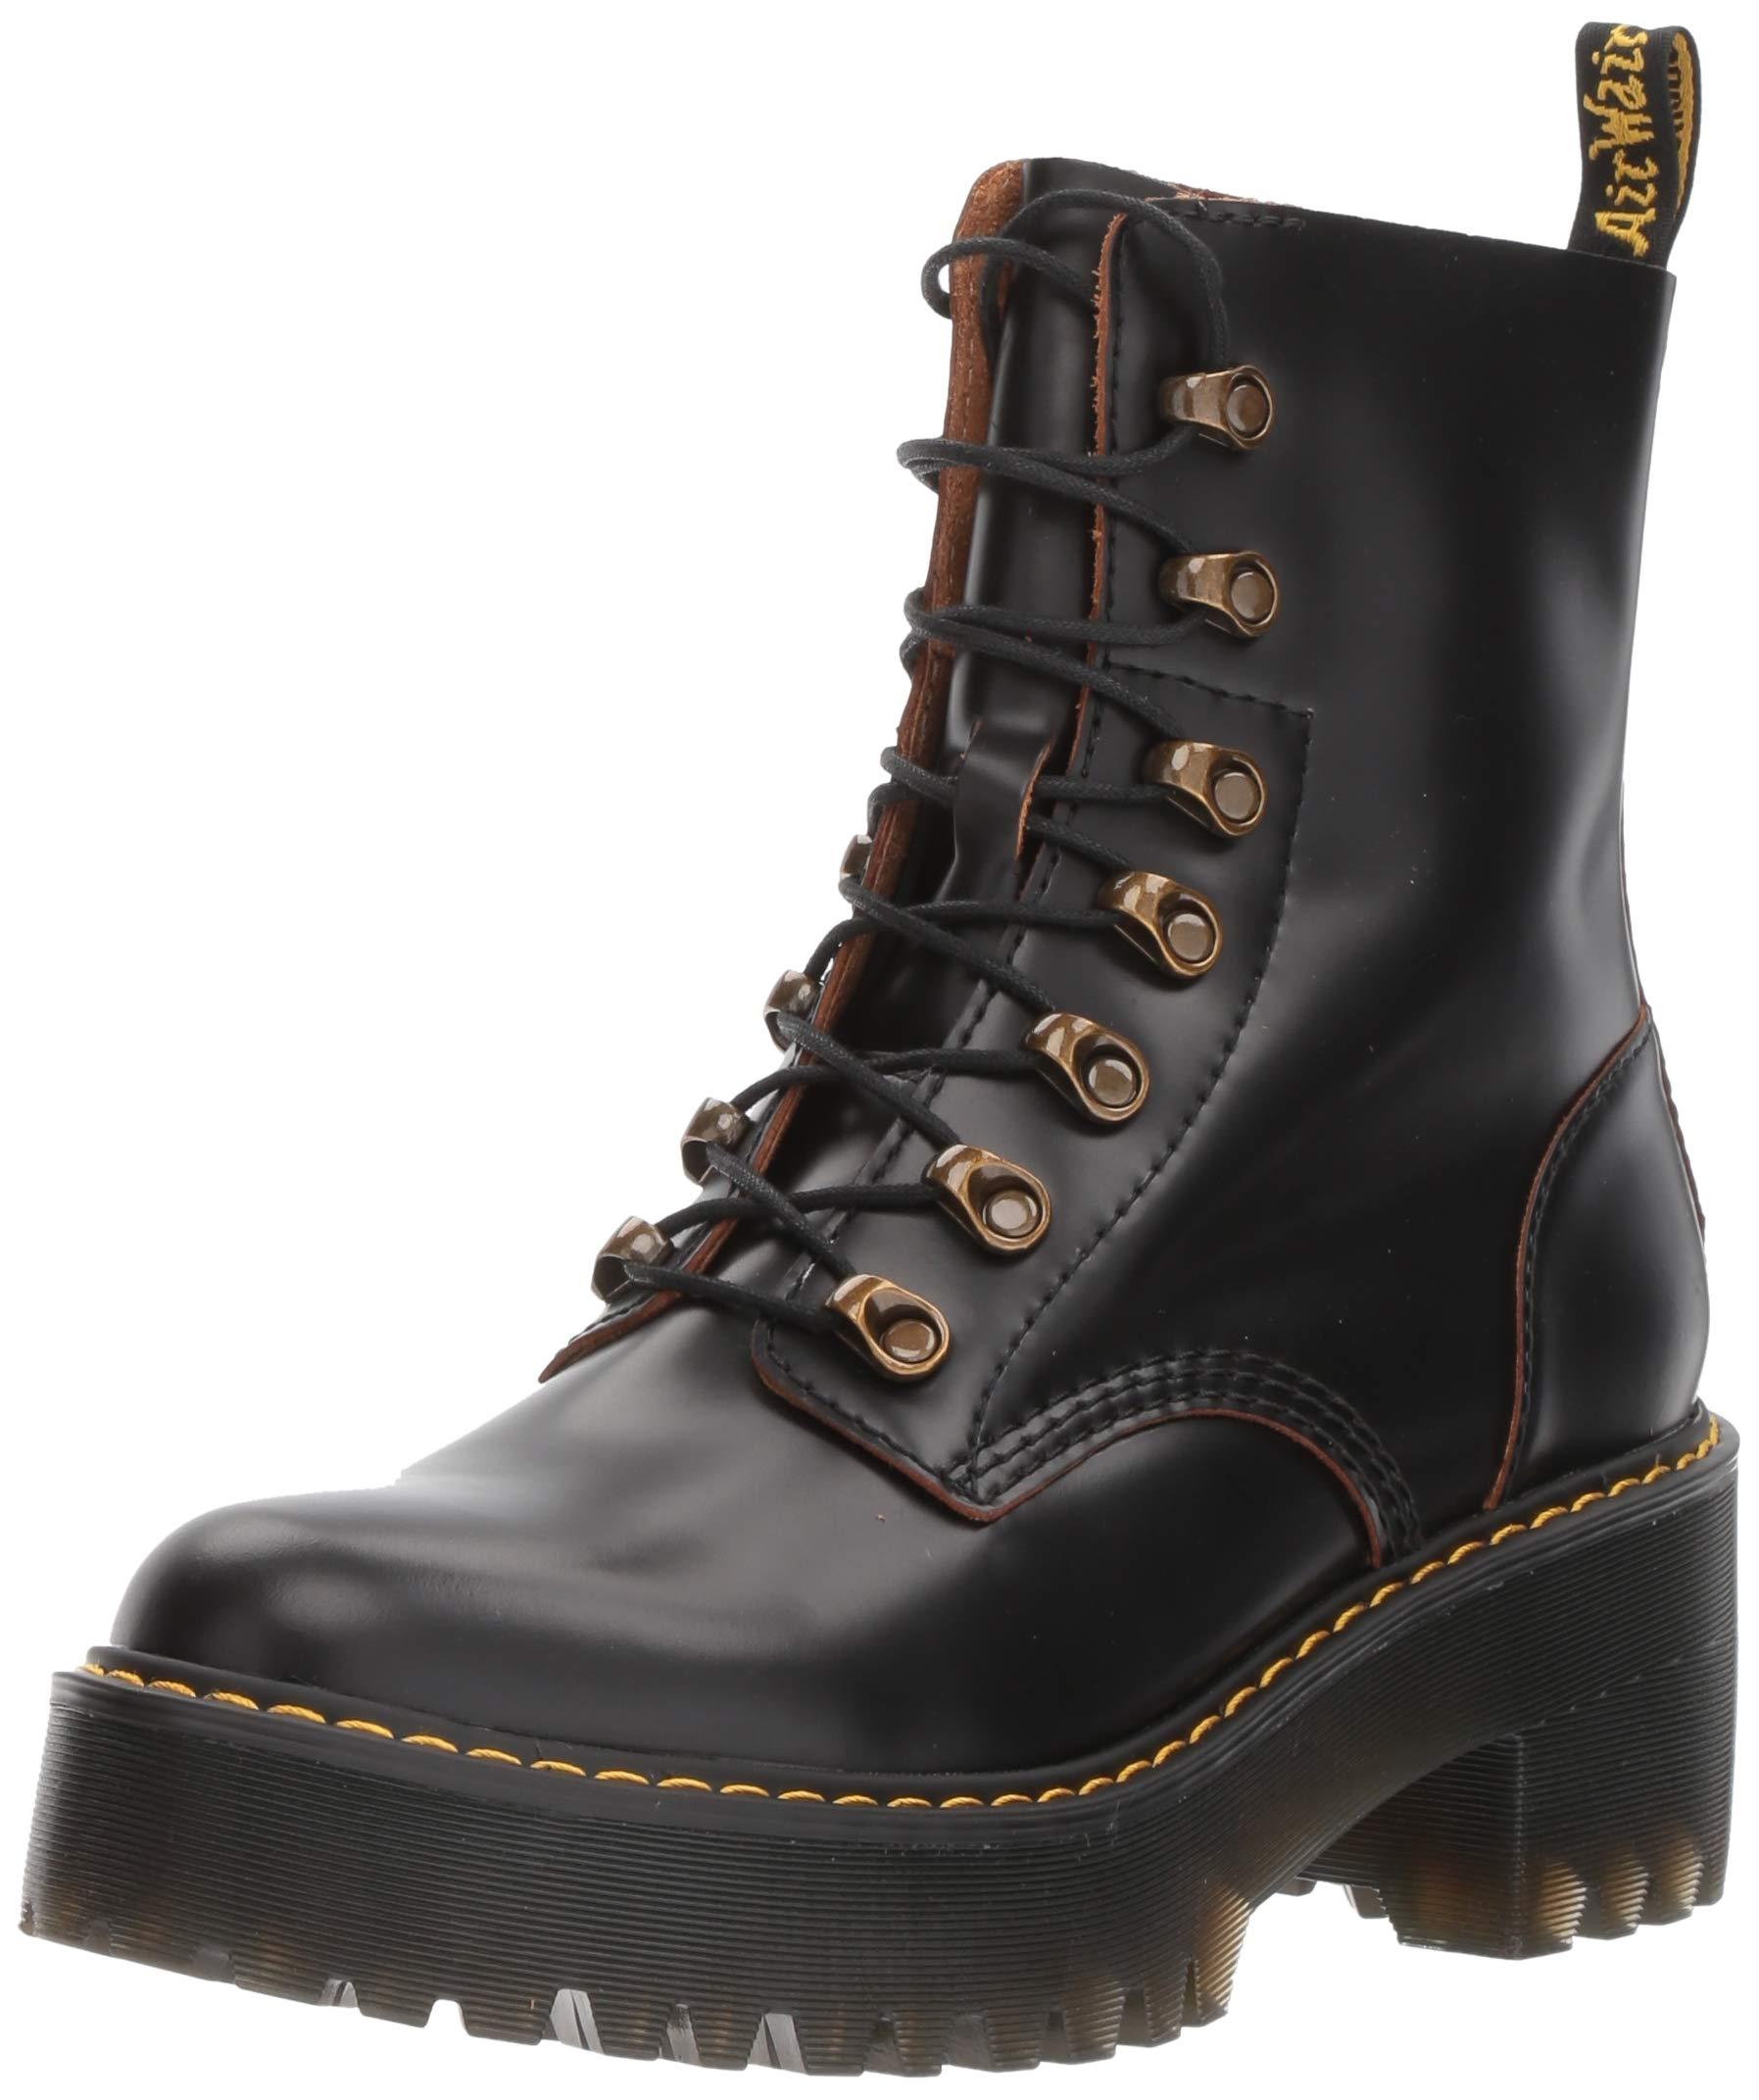 Dr. Martens Shoes Leona Boot, Black Vintage Smooth, 3 UK, Women's 5 US by Dr. Martens